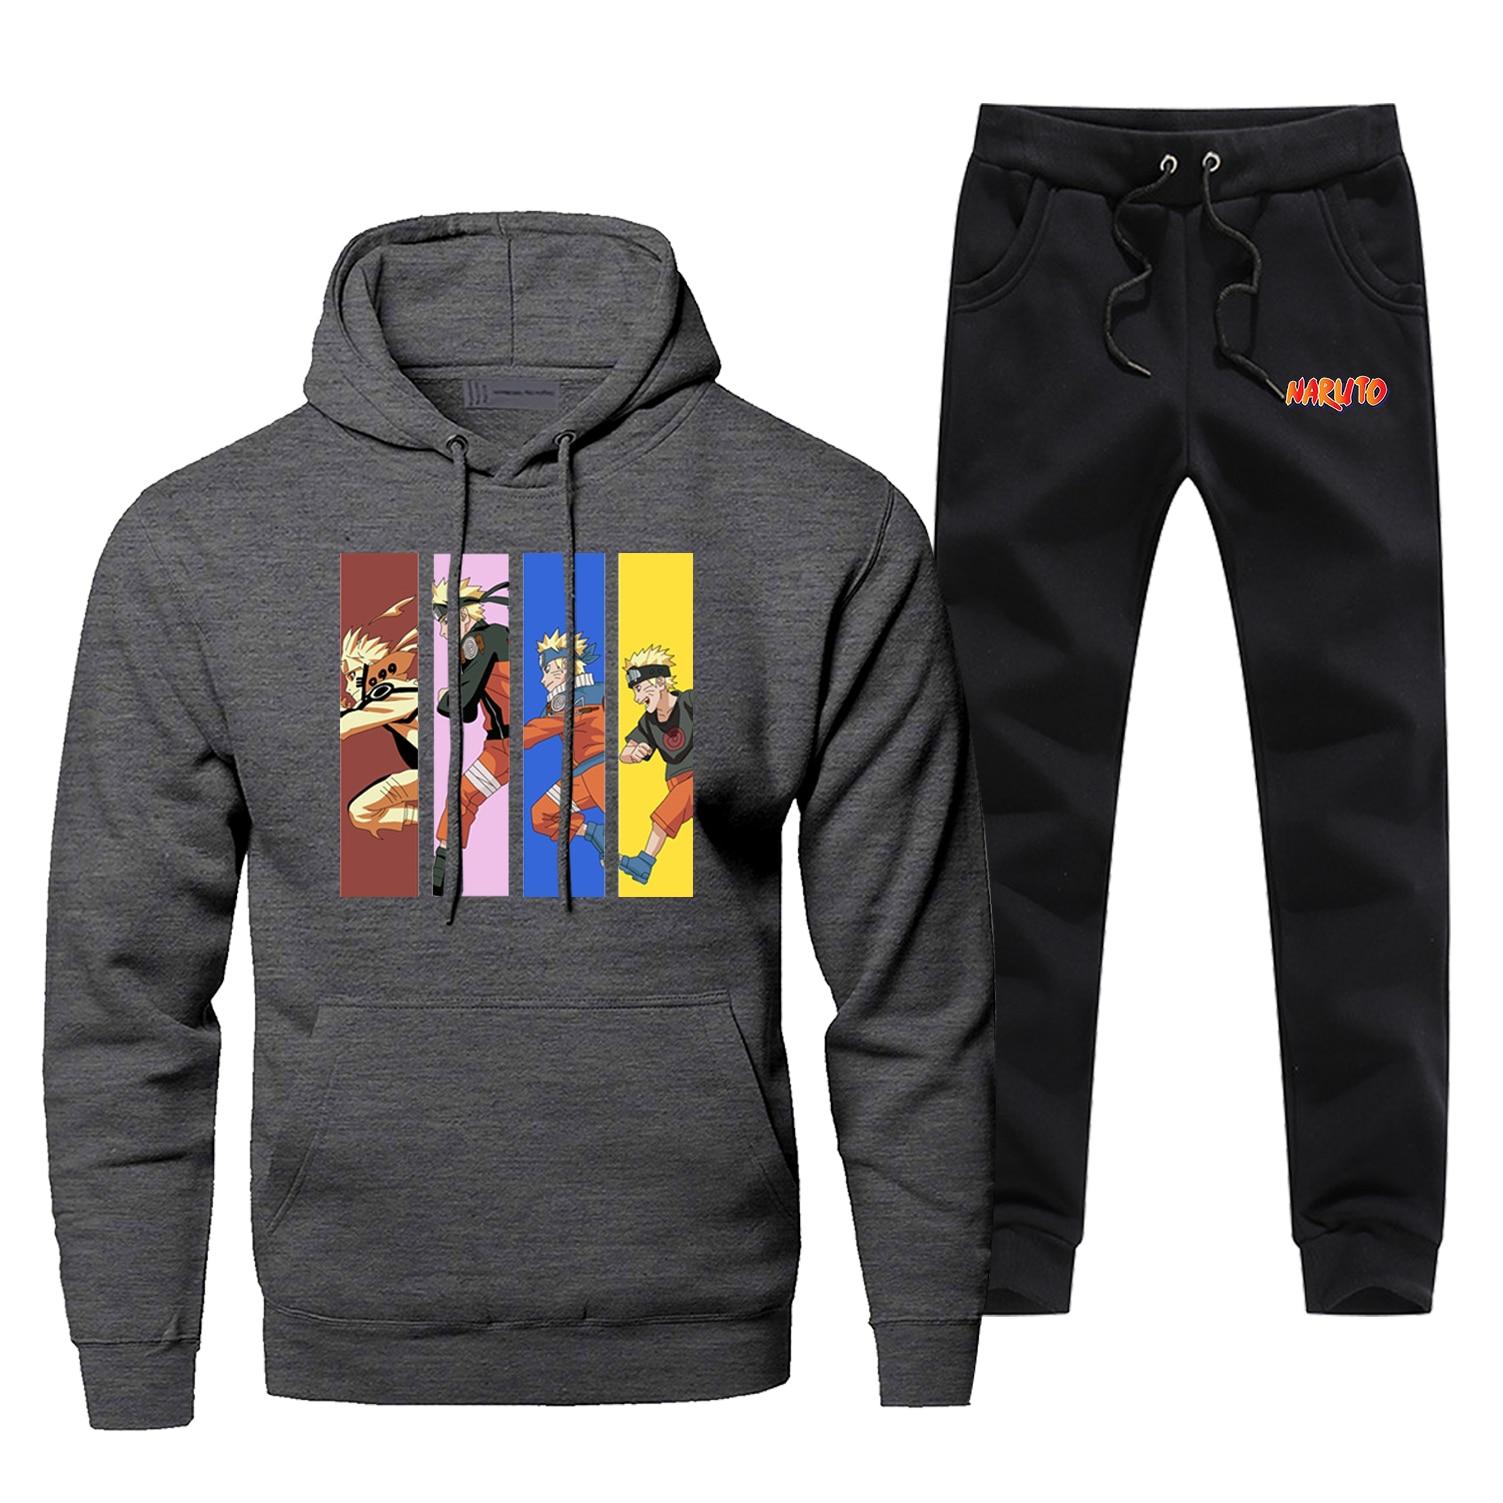 Japan Anime Male Set Uzumaki Naruto Pants Sweatshirts Rikudousennin Modo Harajuku Fashion Men's Full Suit Tracksuit Streetwear